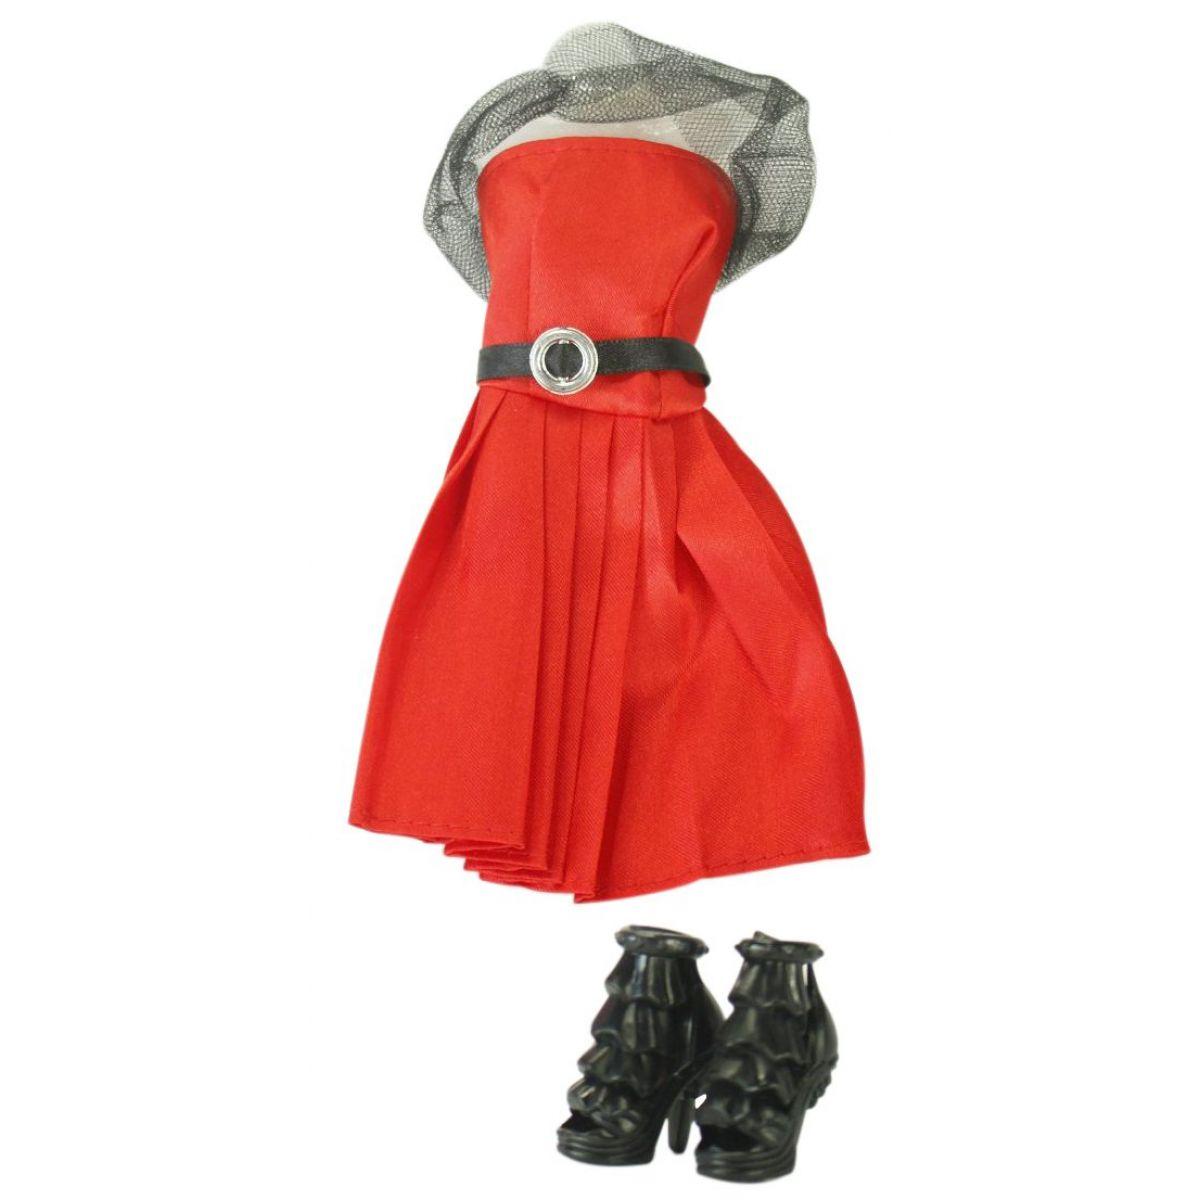 EP Line Šatičky pro panenky s doplňky červené šaty s černým páskem